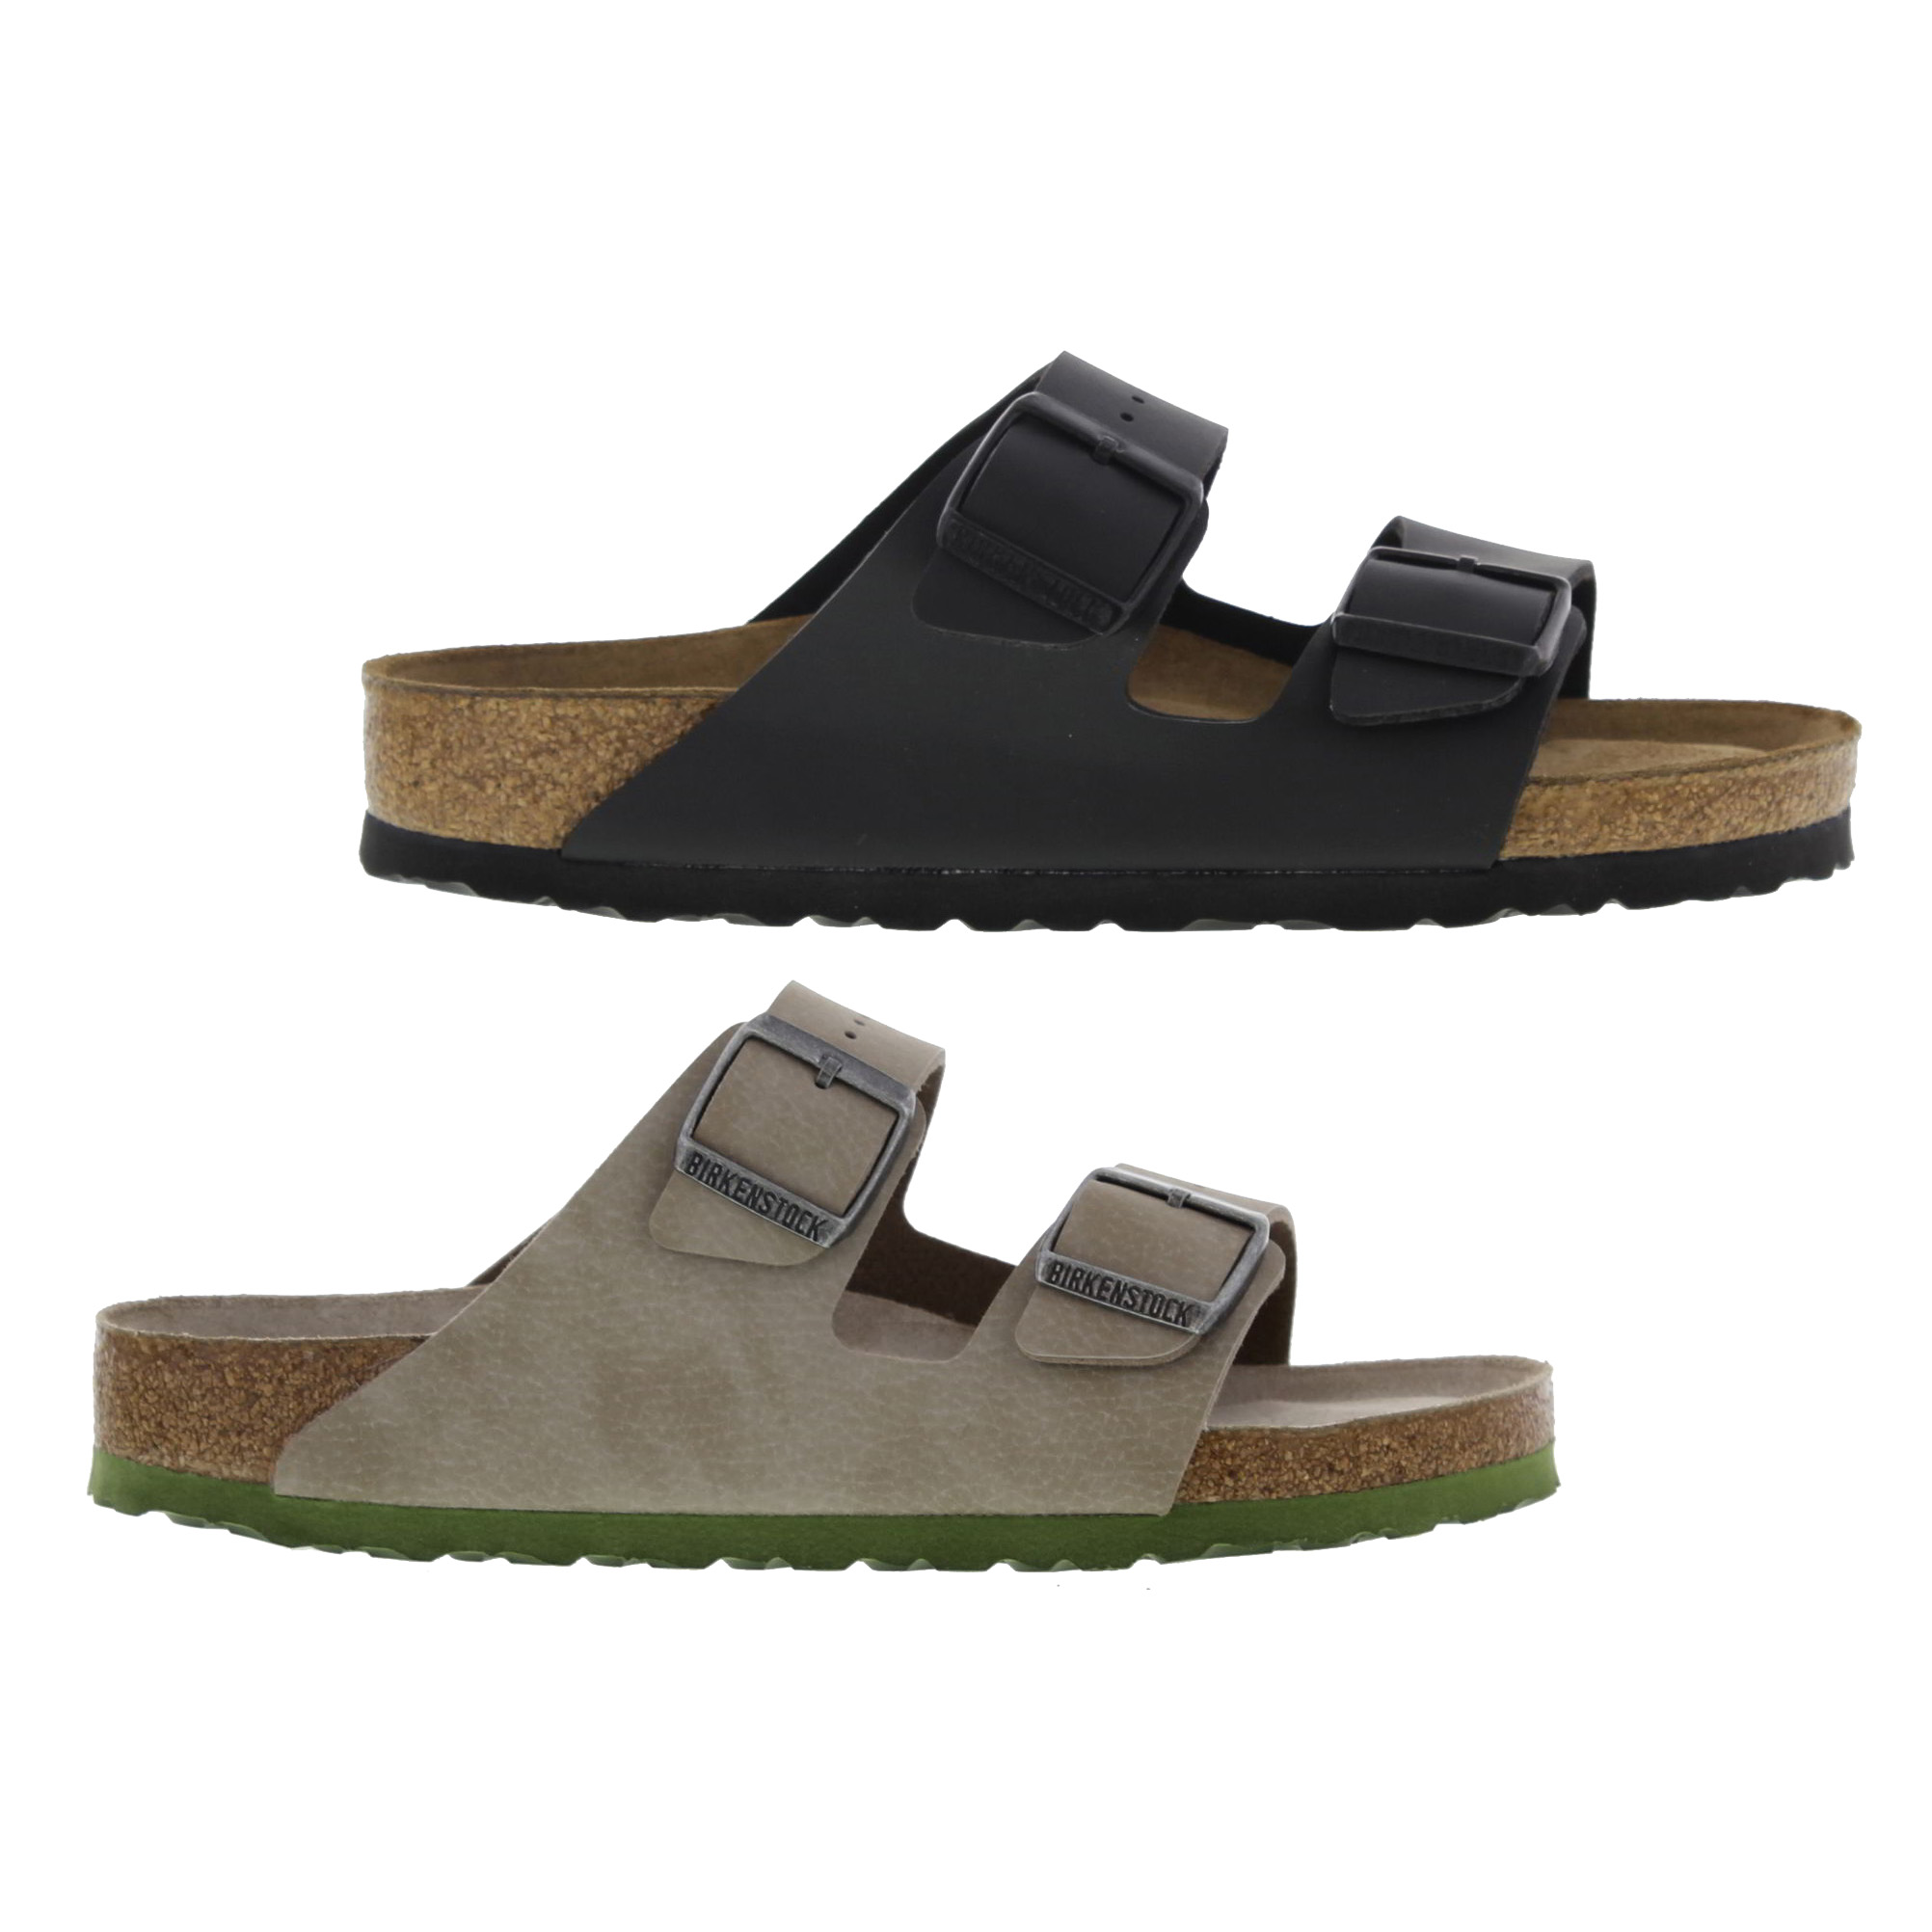 Birkenstock Arizona Soft Footbed Regular Fit Mens Womens Sandals ... 5e8f9597c24